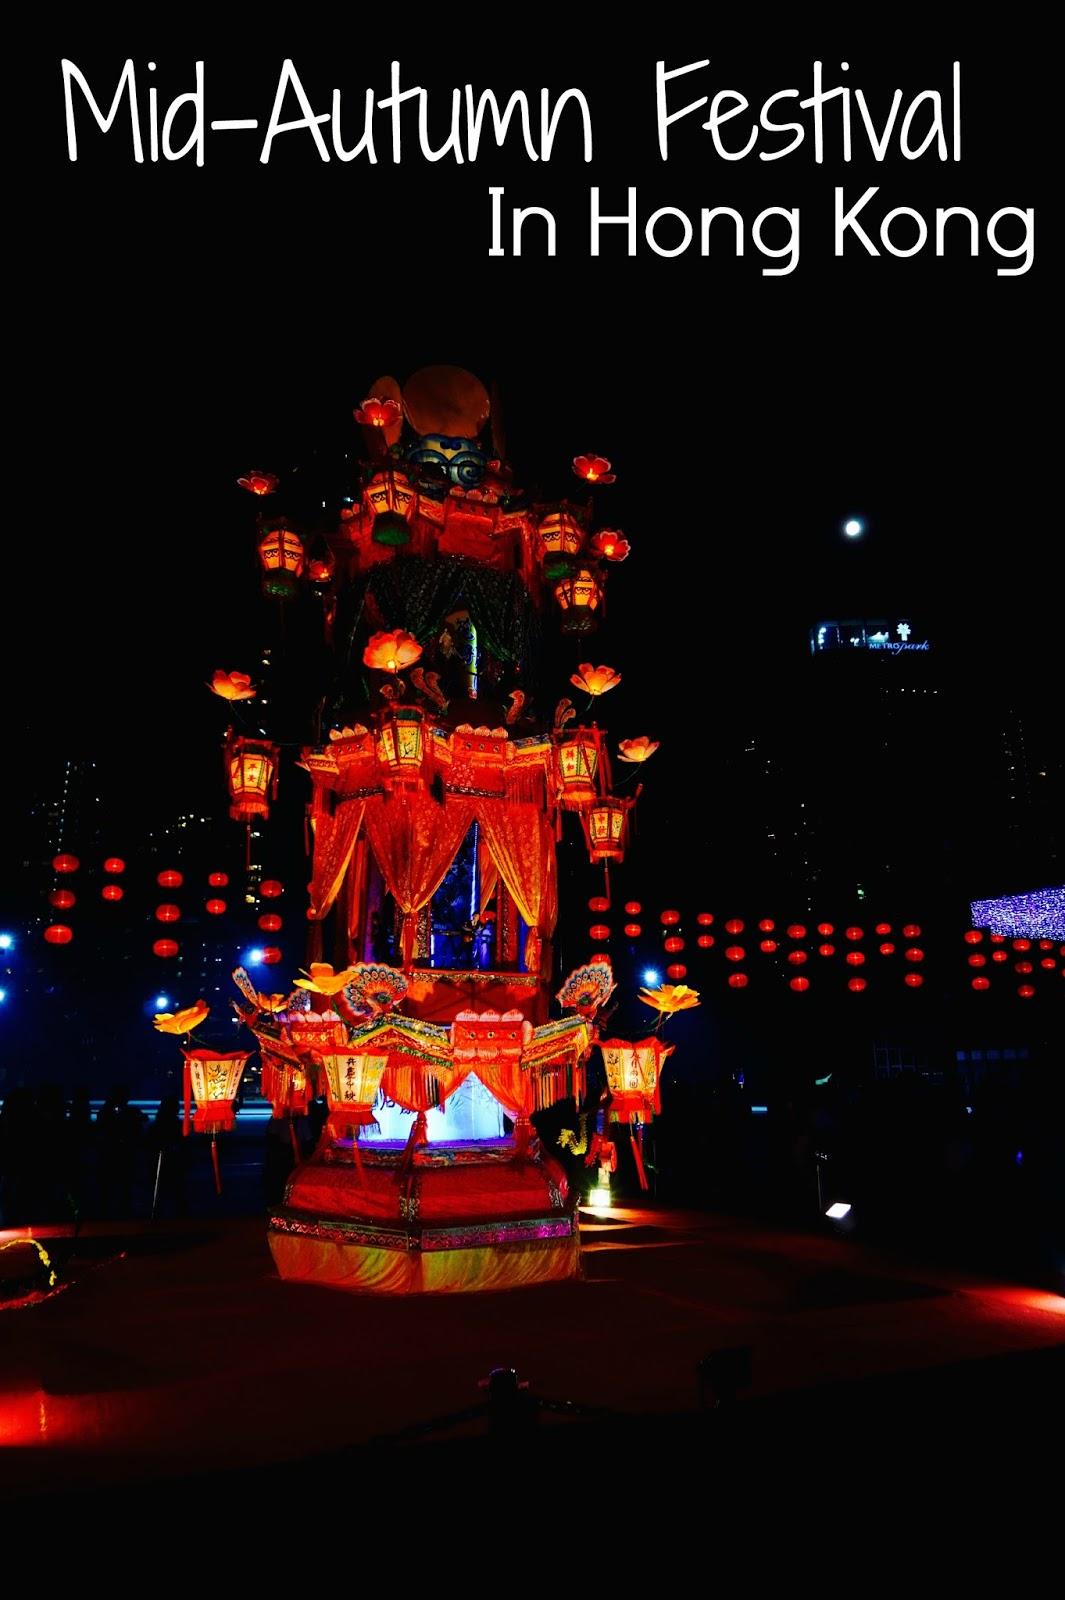 Mid Autum Festival: Mid-Autumn Festival Celebrations